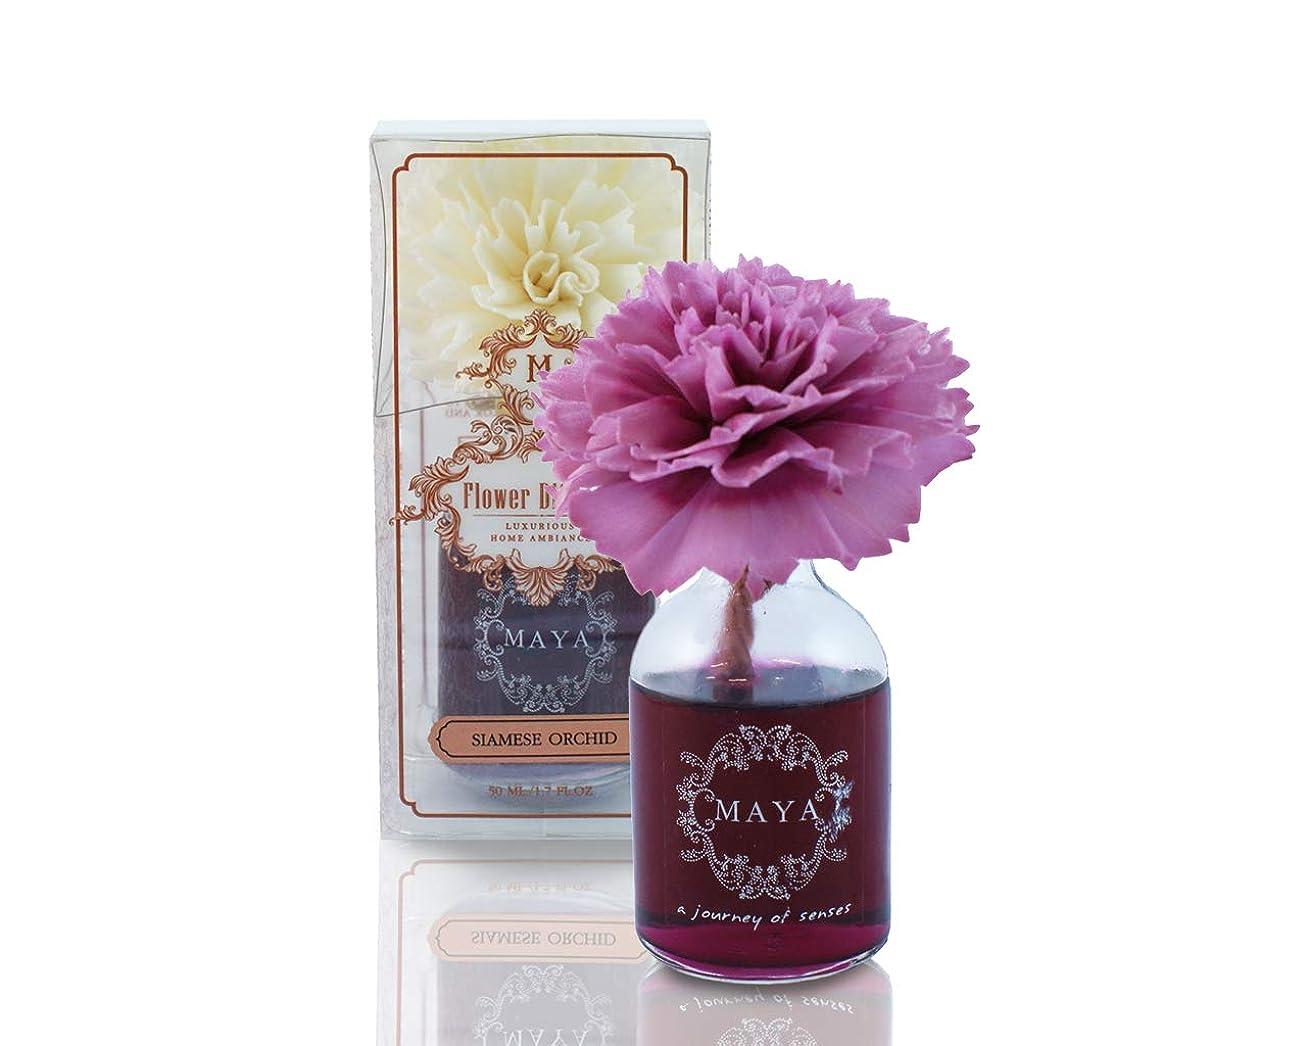 MAYA フラワーディフューザー シアメセオーキッド 50ml [並行輸入品] |Aroma Flower Diffuser - Saimese Orchid 50ml